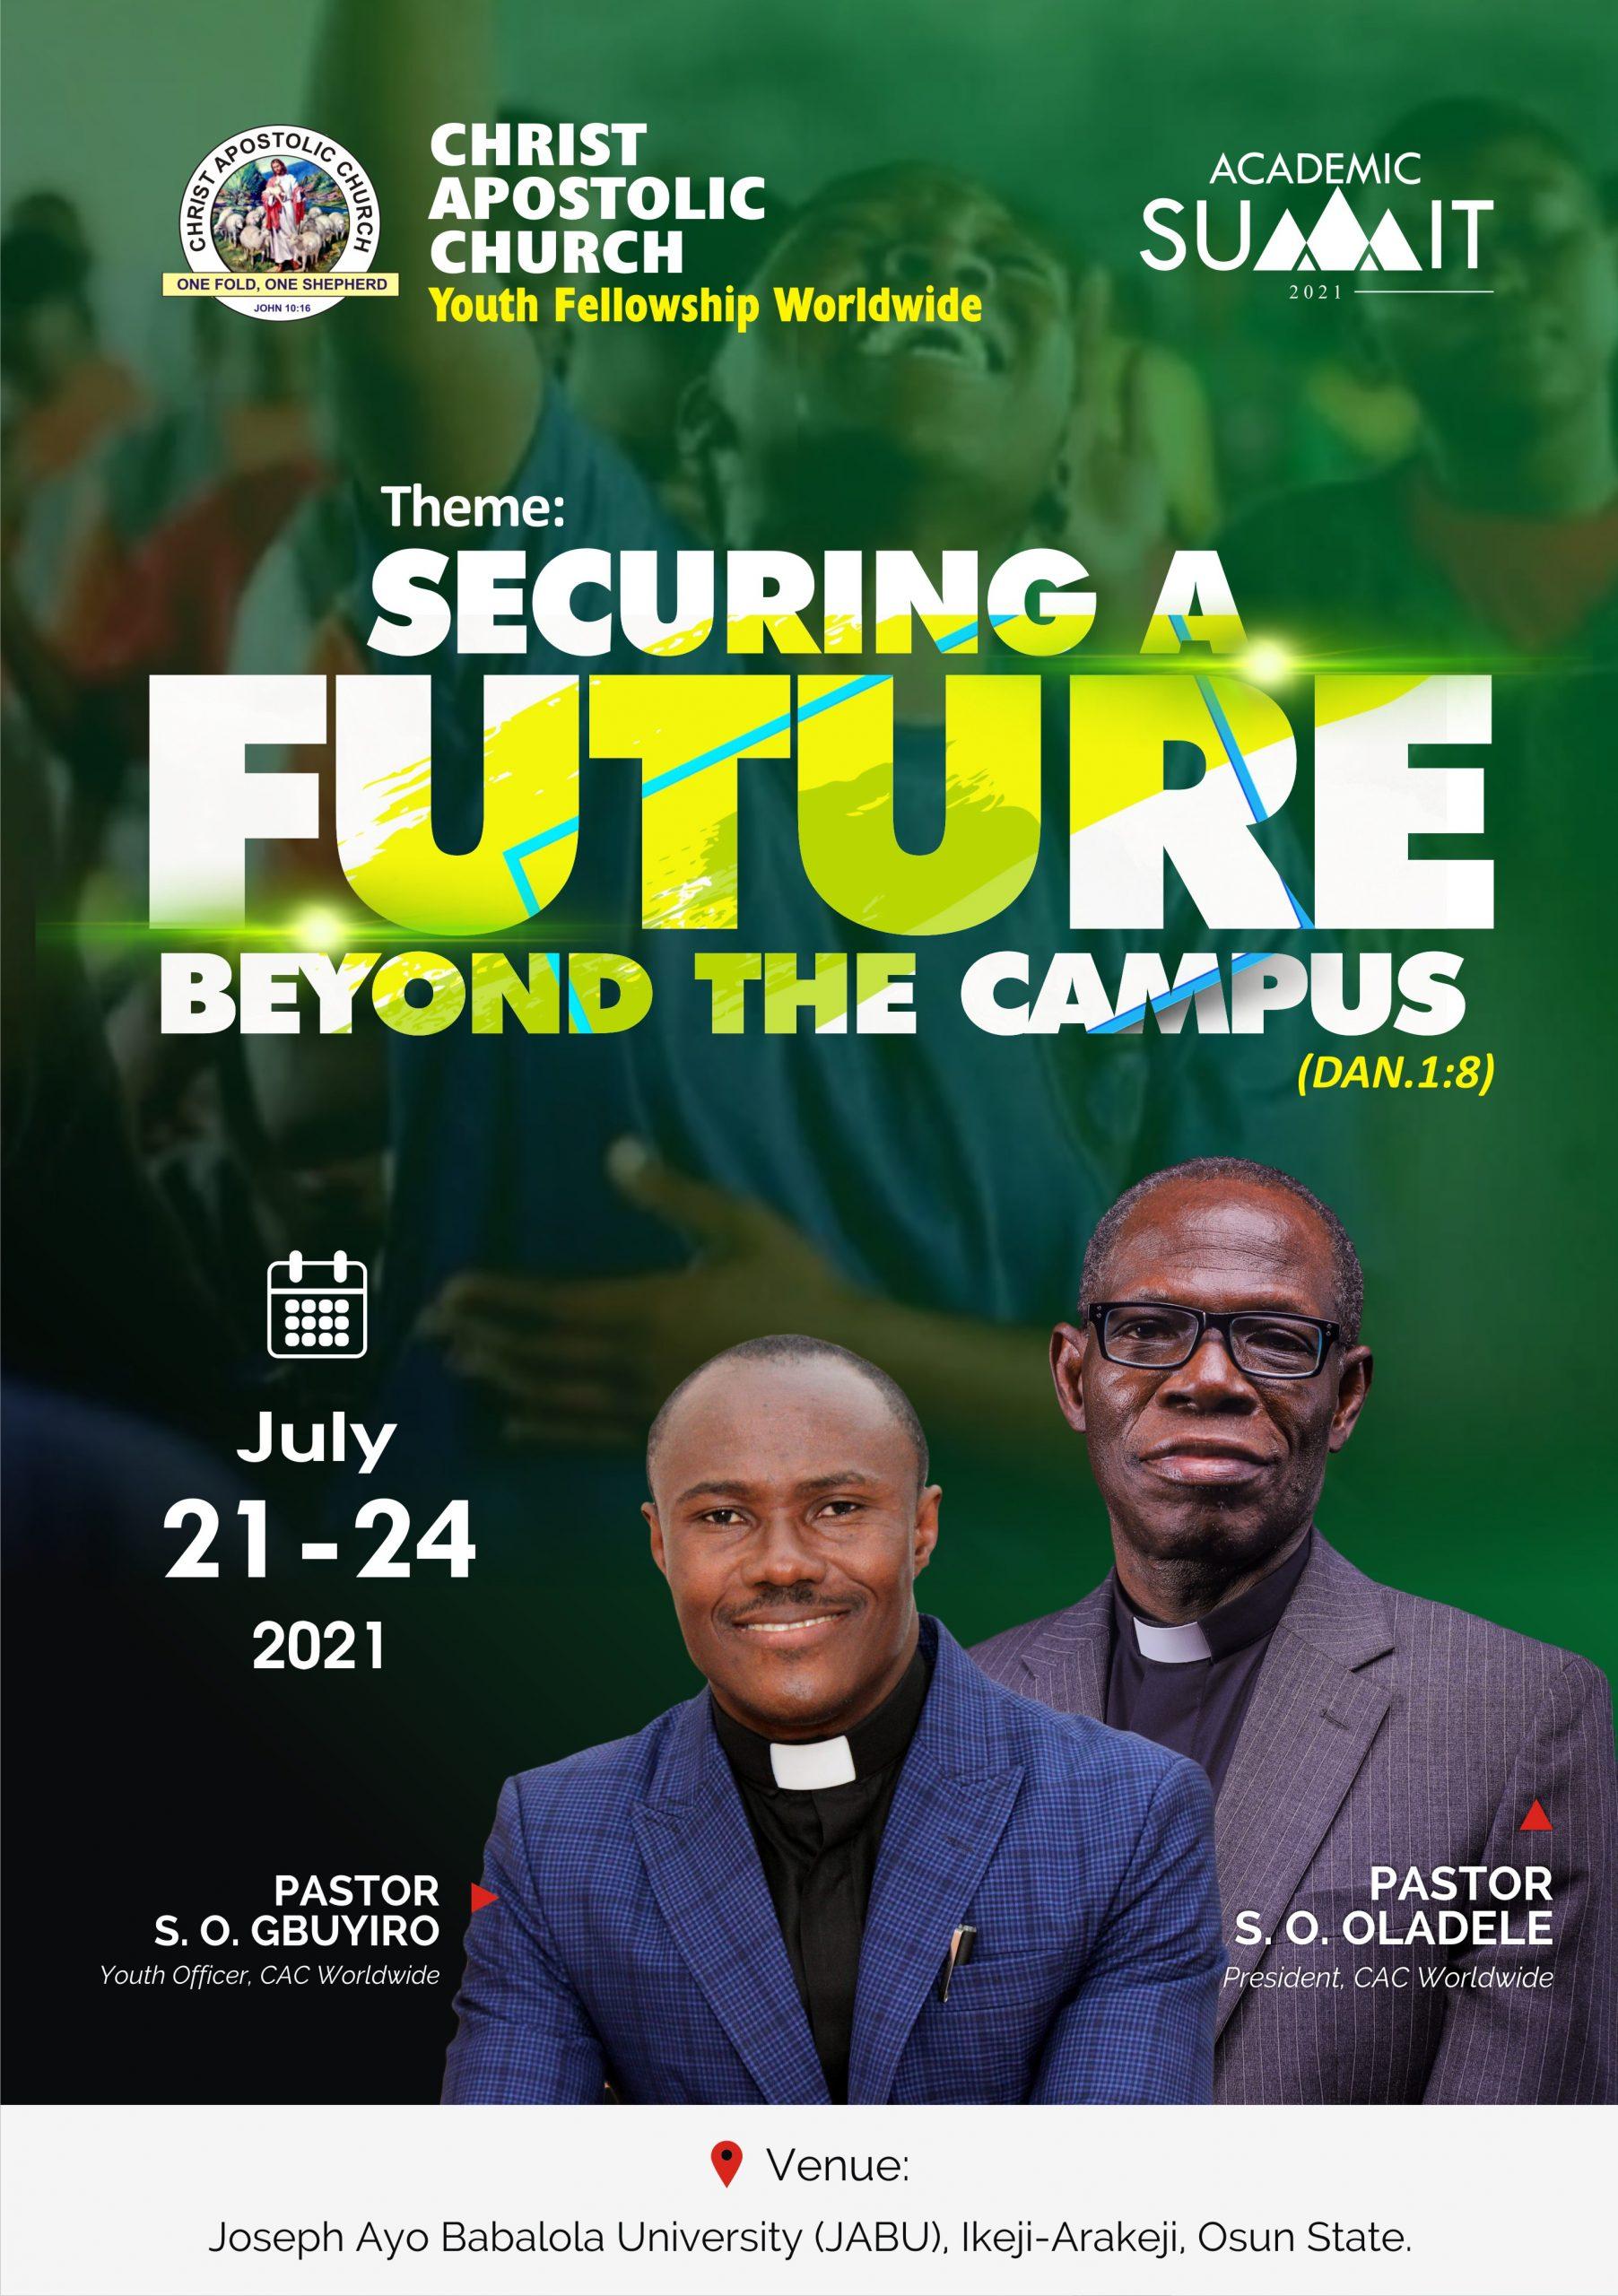 Academic Summit 2021